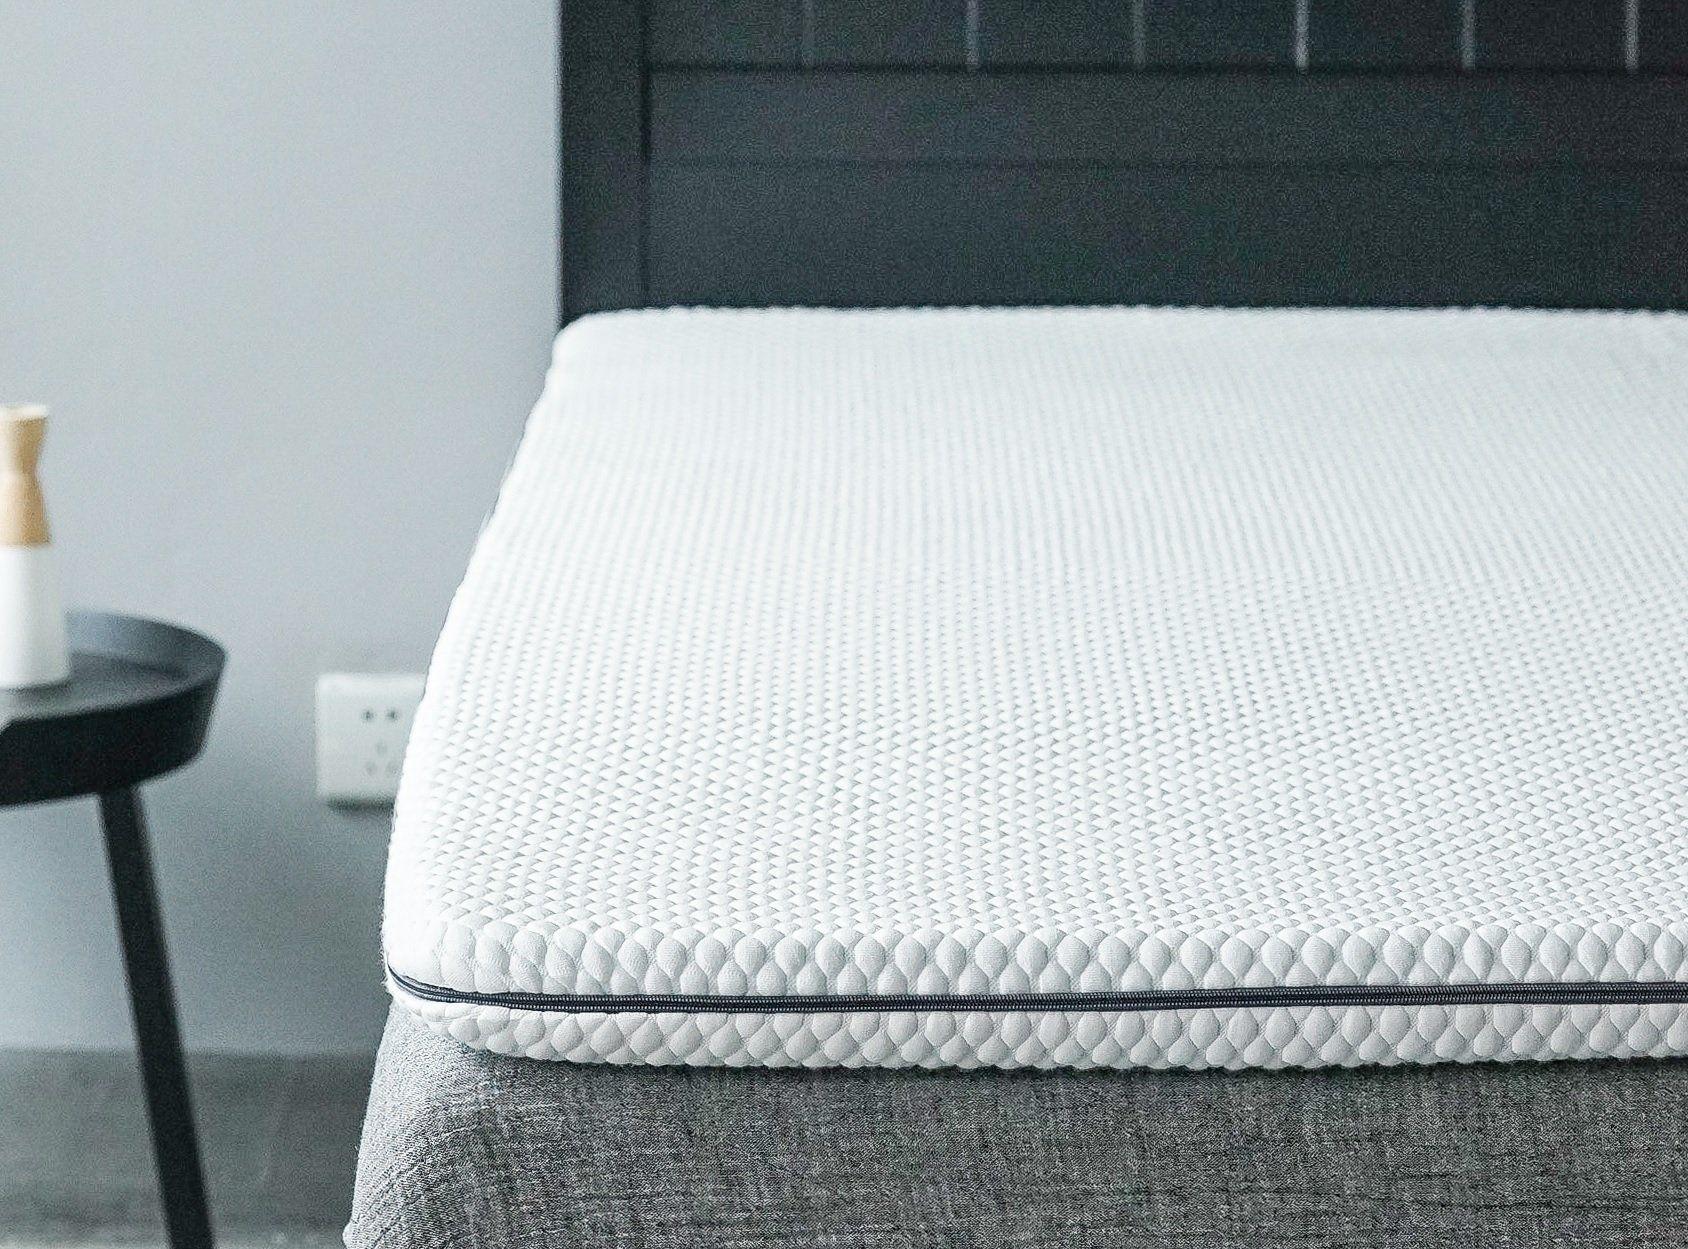 allrange 2 inch ultra soft cooling gel memory foam mattress topper